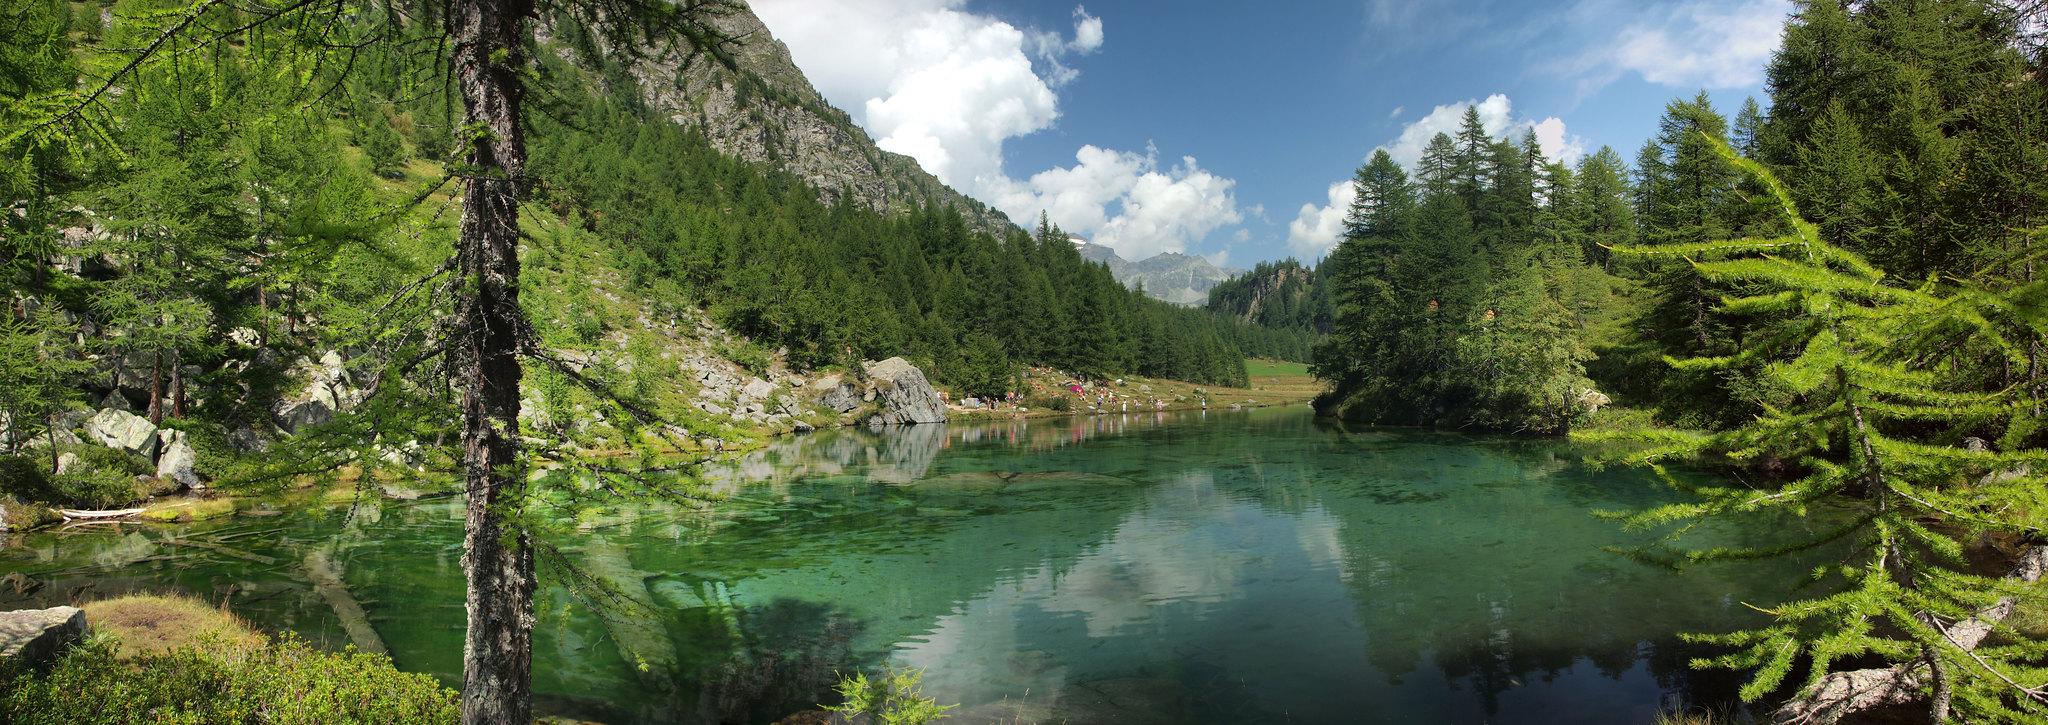 lago delle streghe leggenda